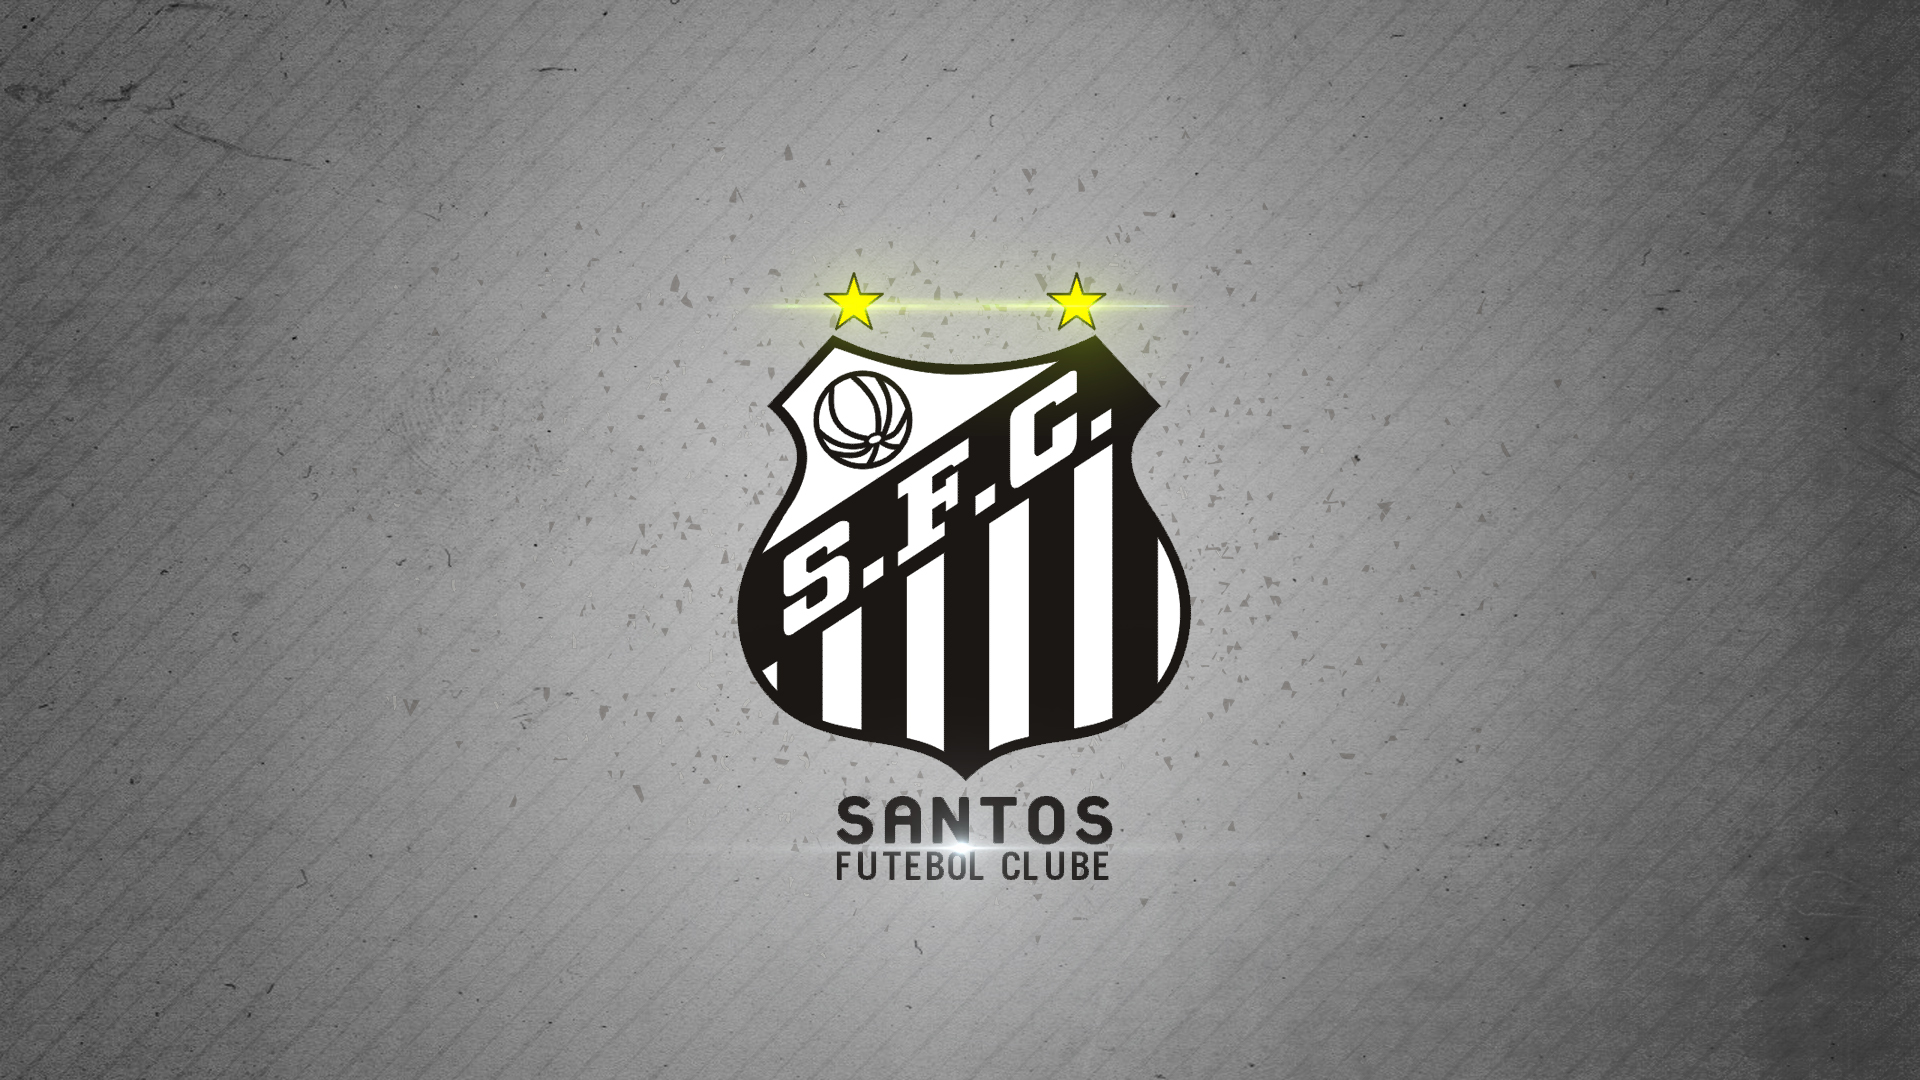 Santos FC HD Wallpaper Background Image 1920x1080 ID985375 1920x1080